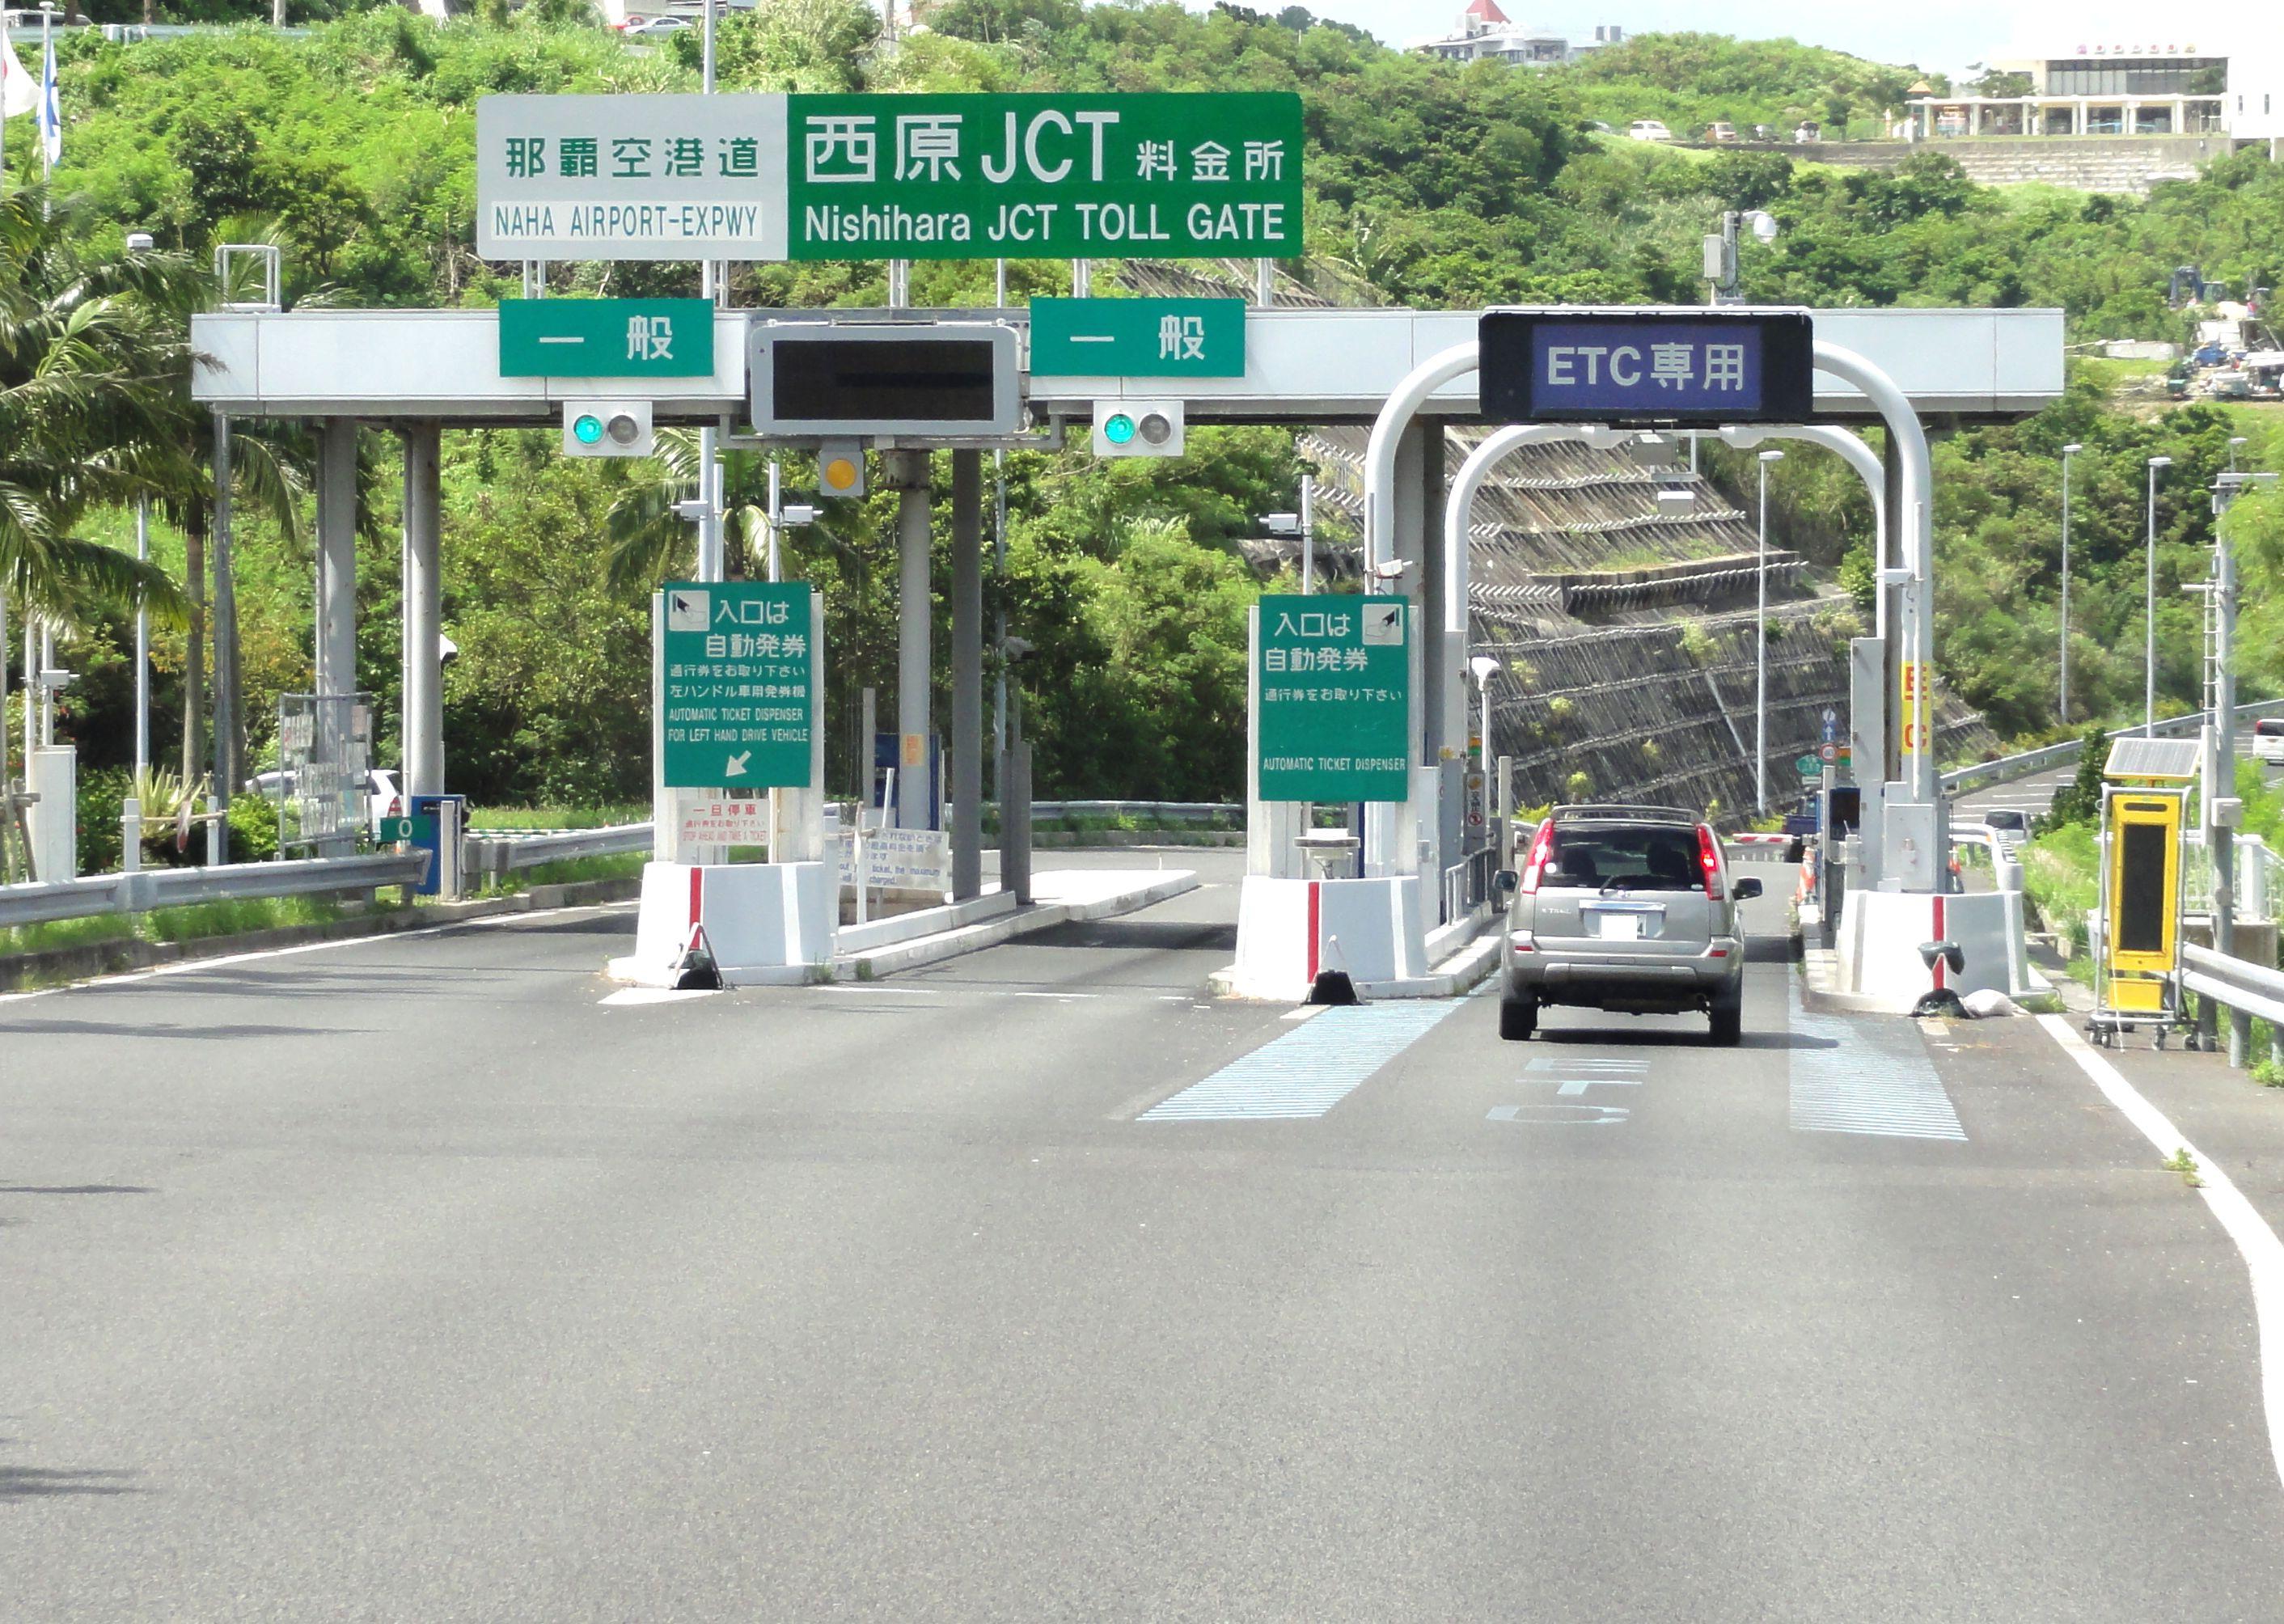 nishihara_jct_toll_gate-20120816